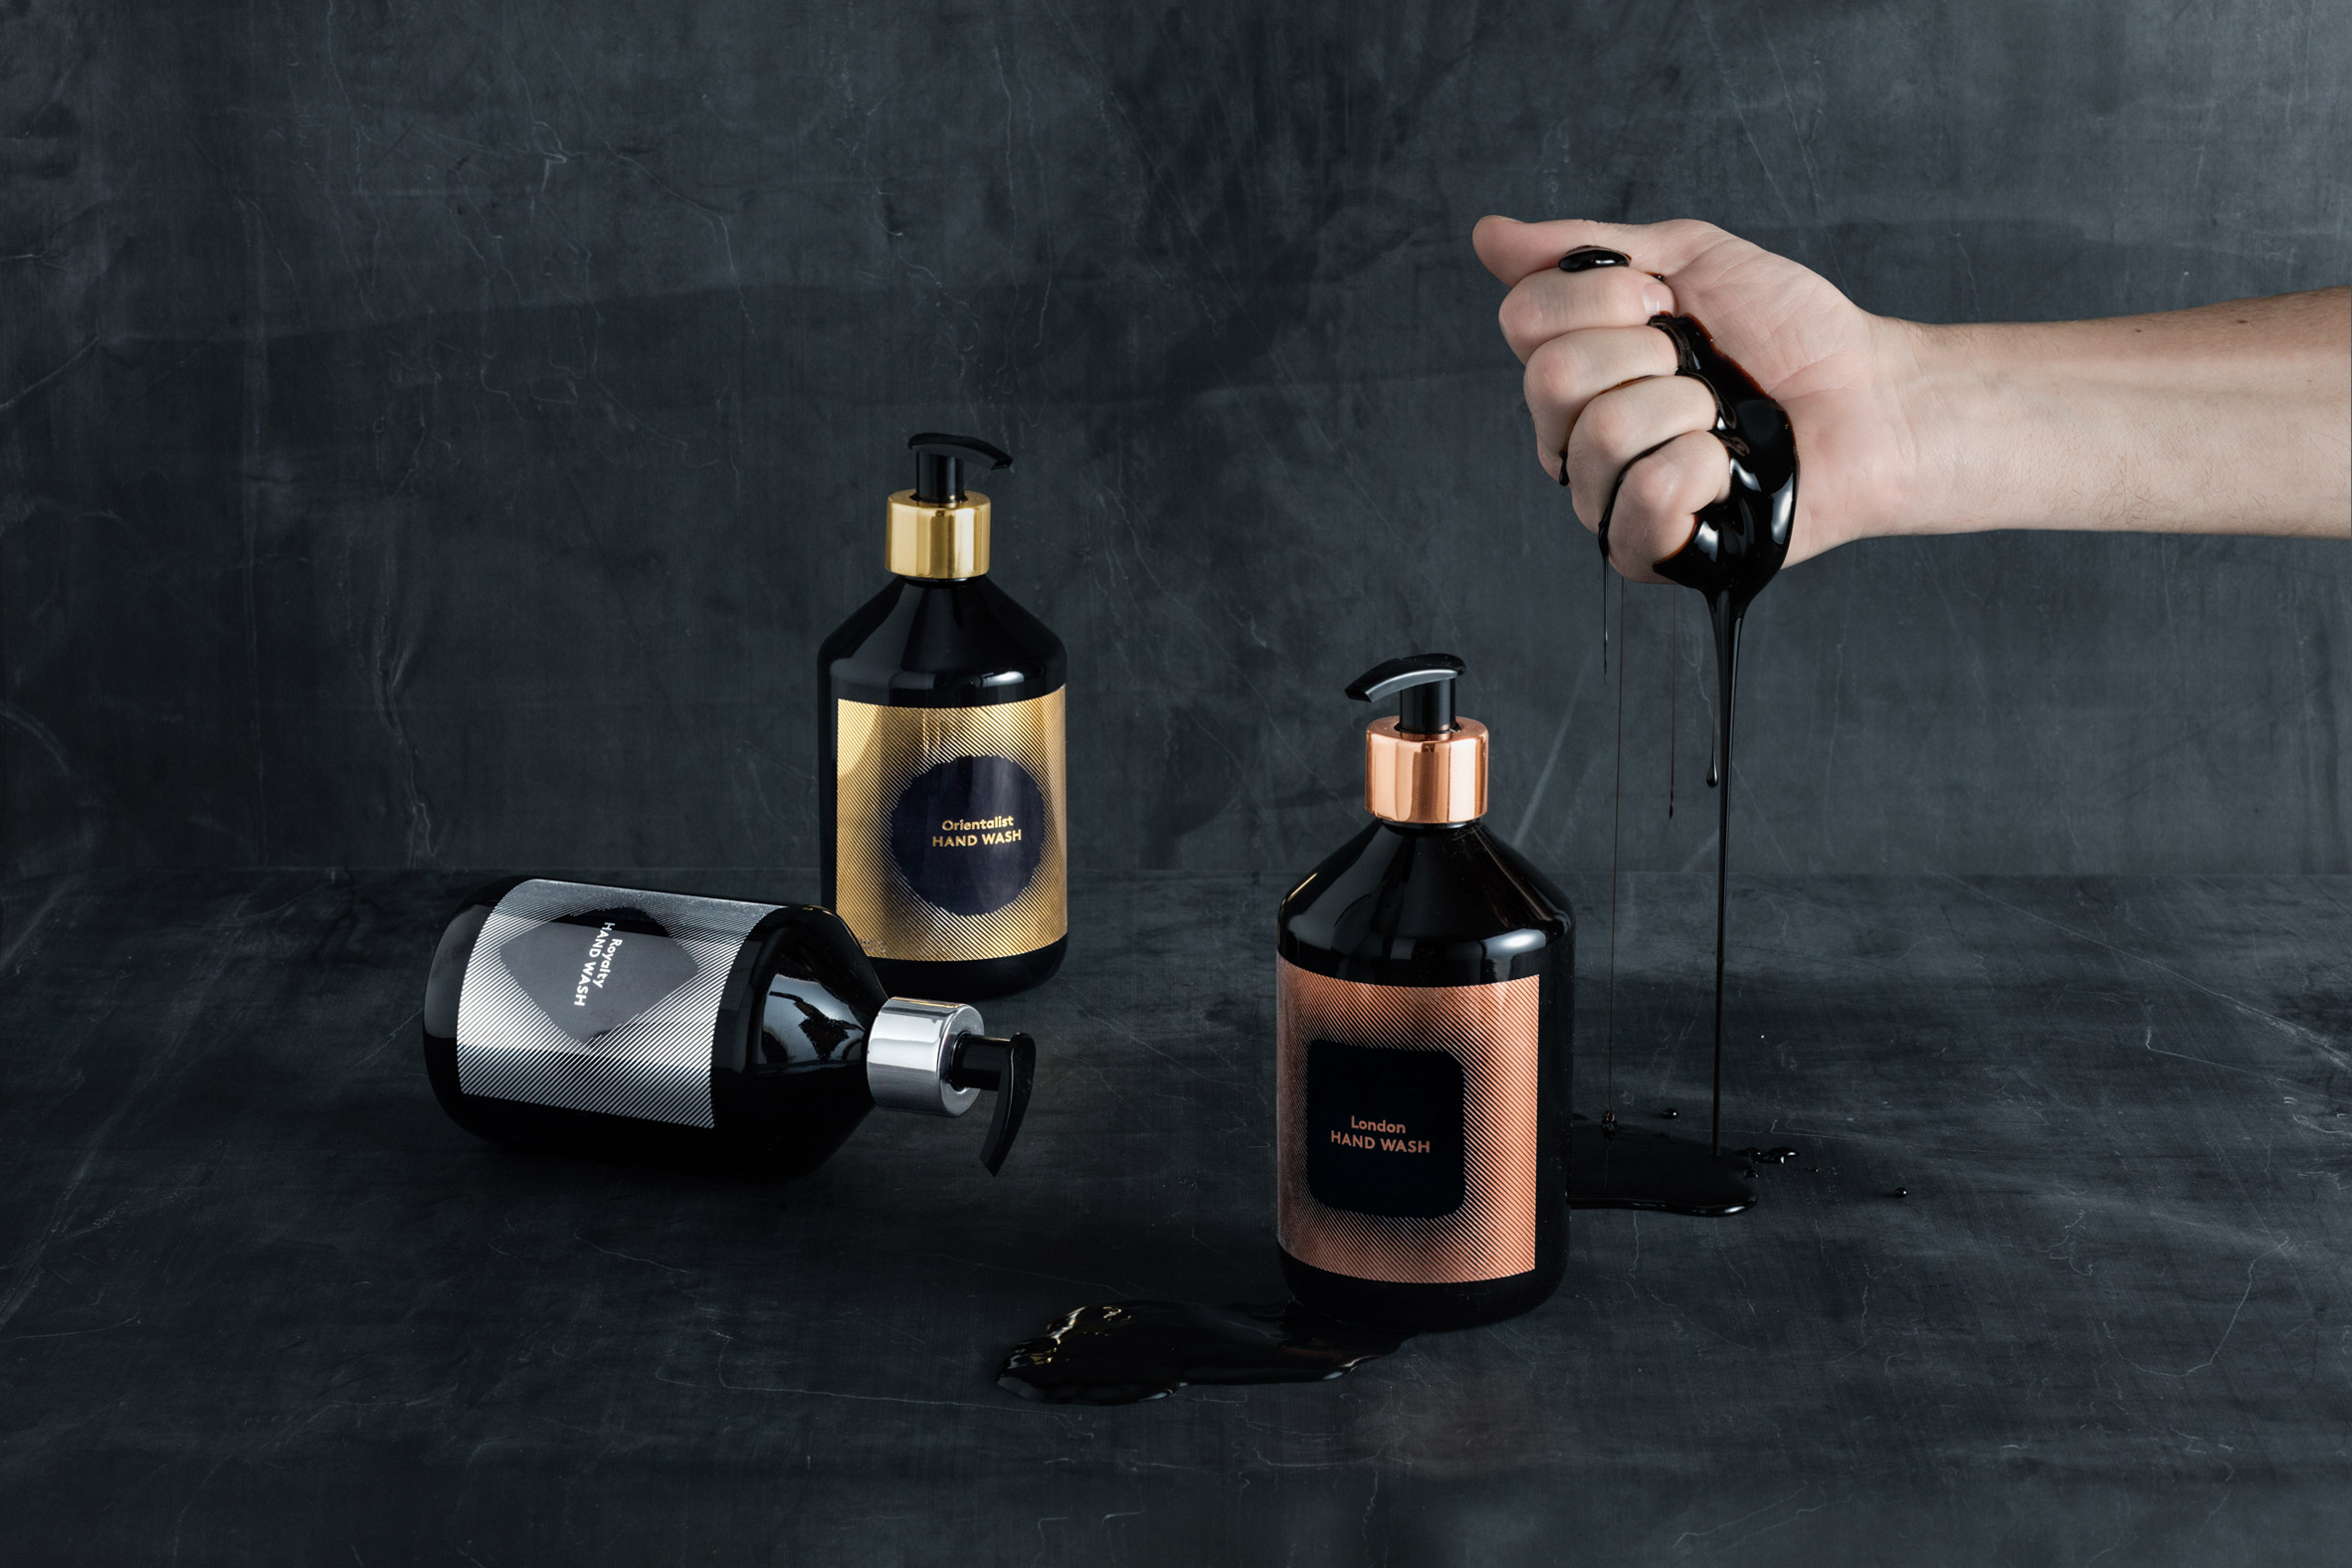 washing-tom-dixon-soap-costmetic-design-products_dezeen_2364_col_5.jpg